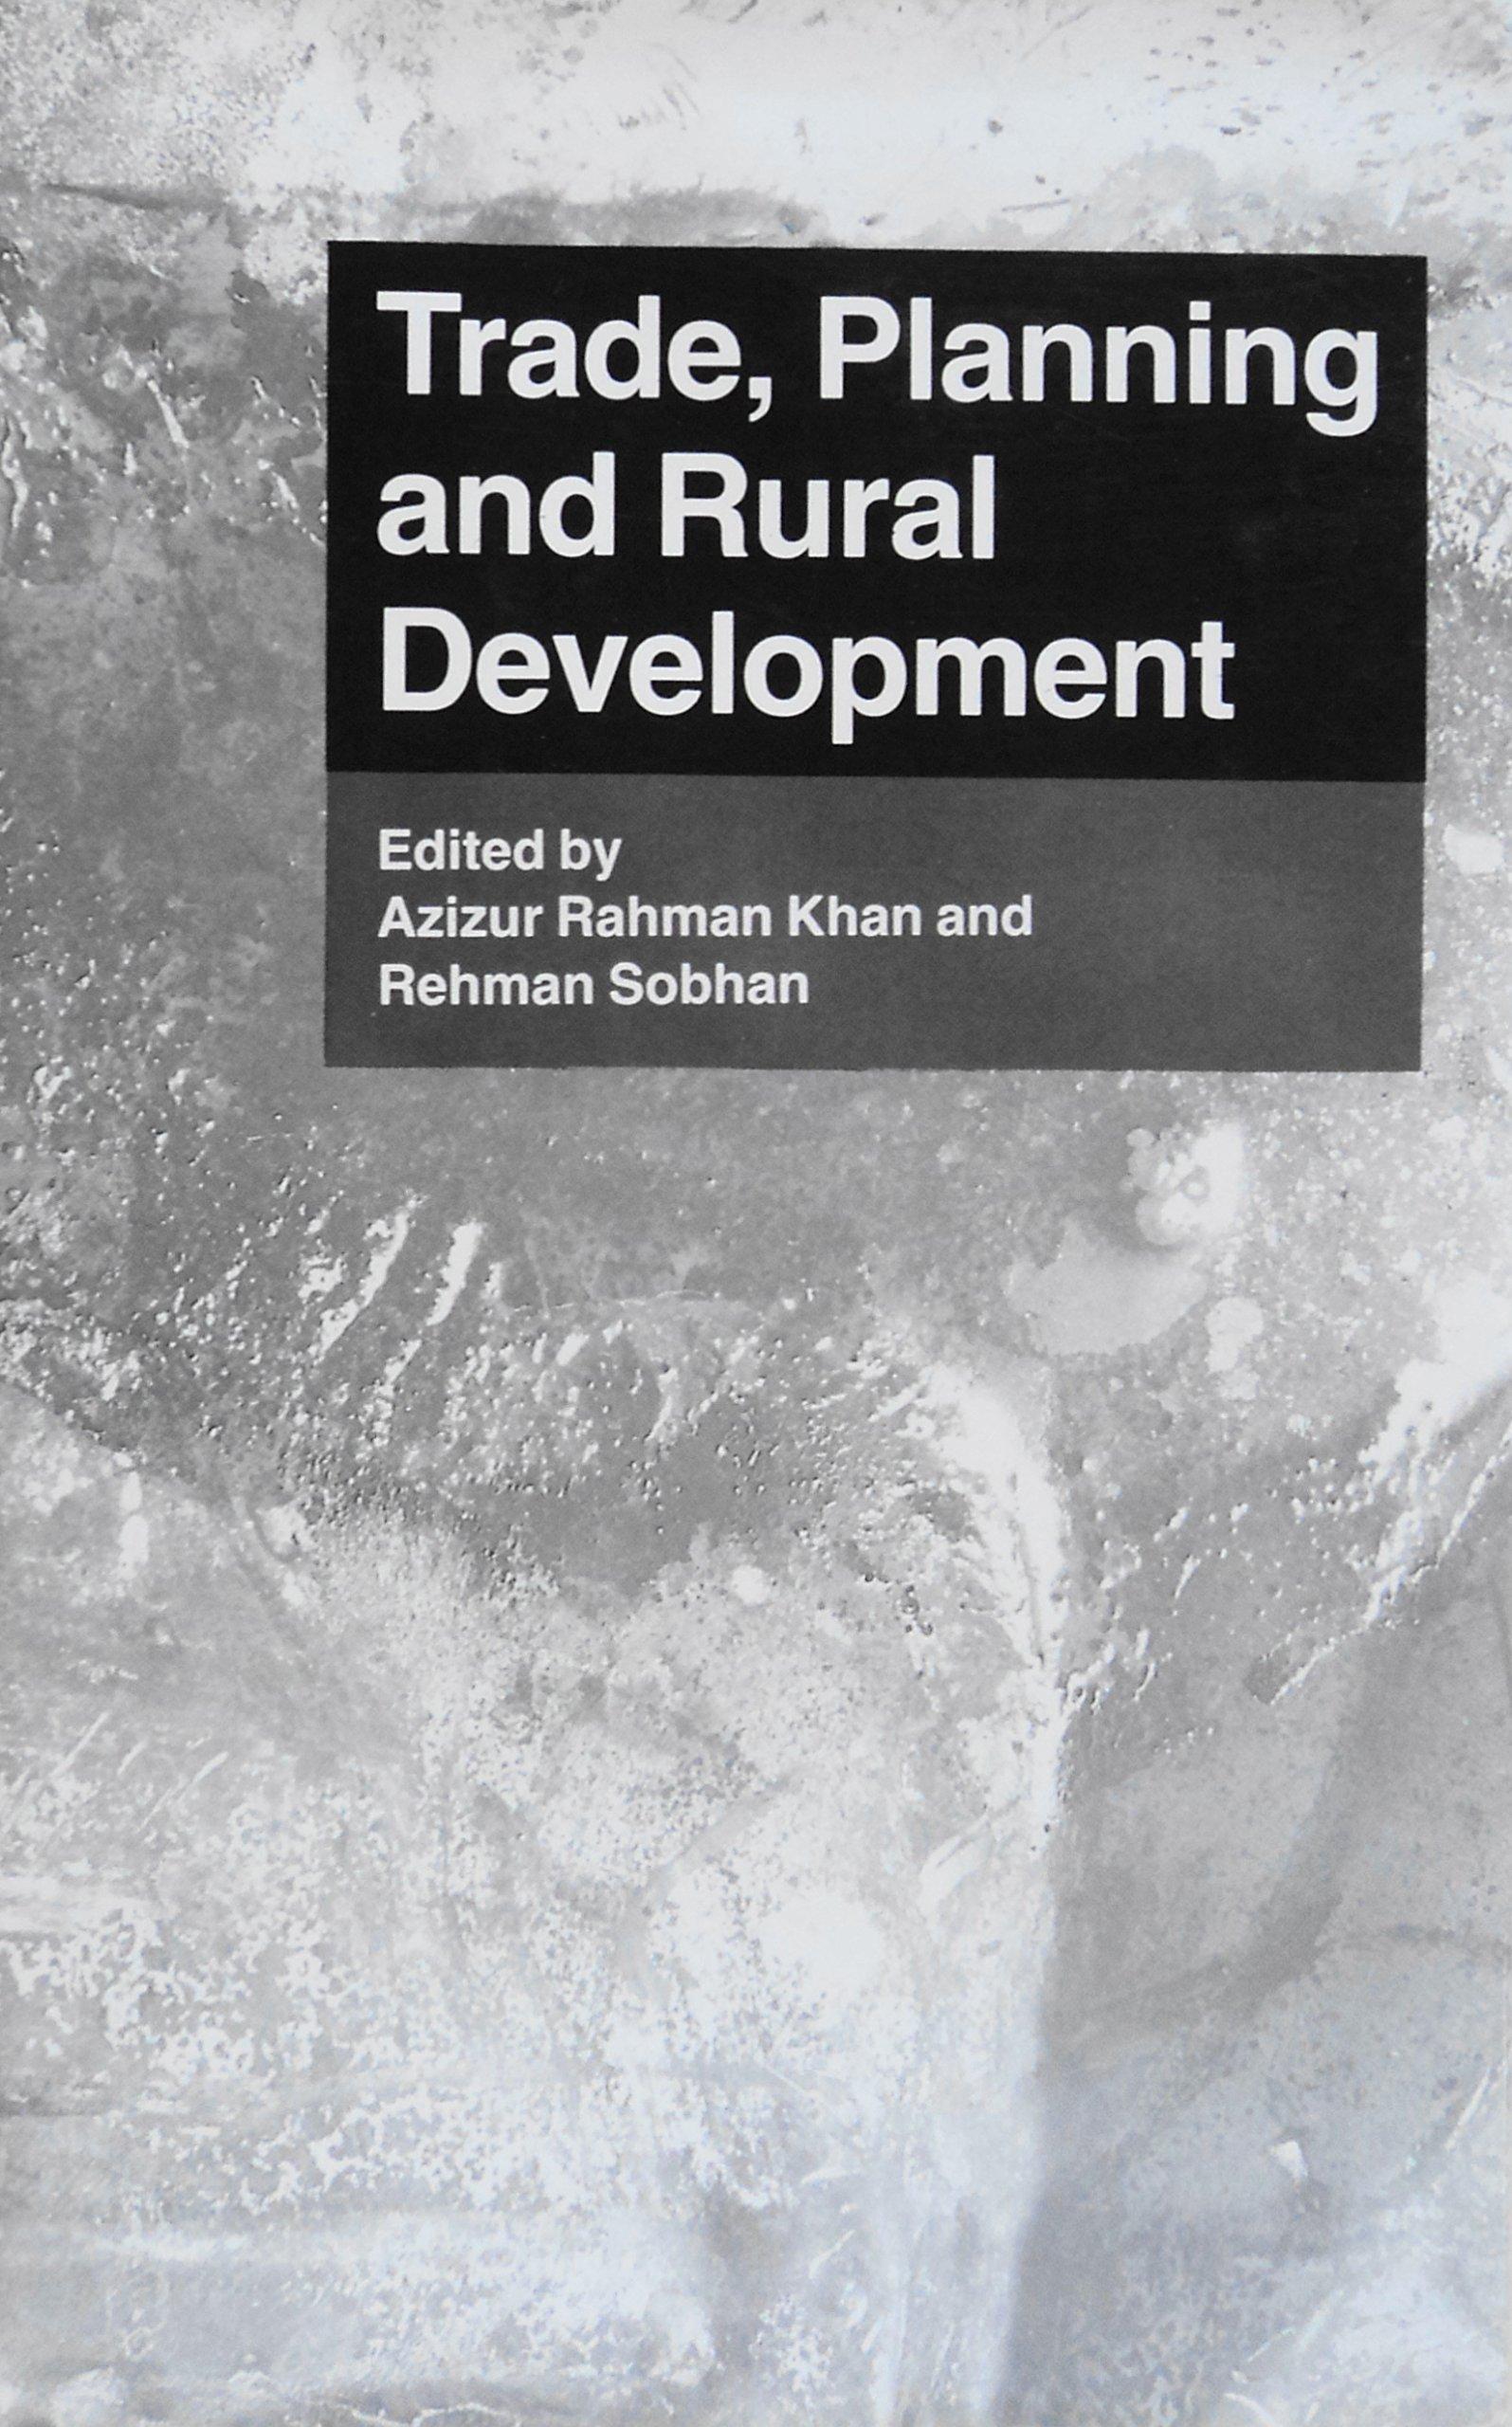 Development Essay Honor In Islam Nurul Planning Rural Trade